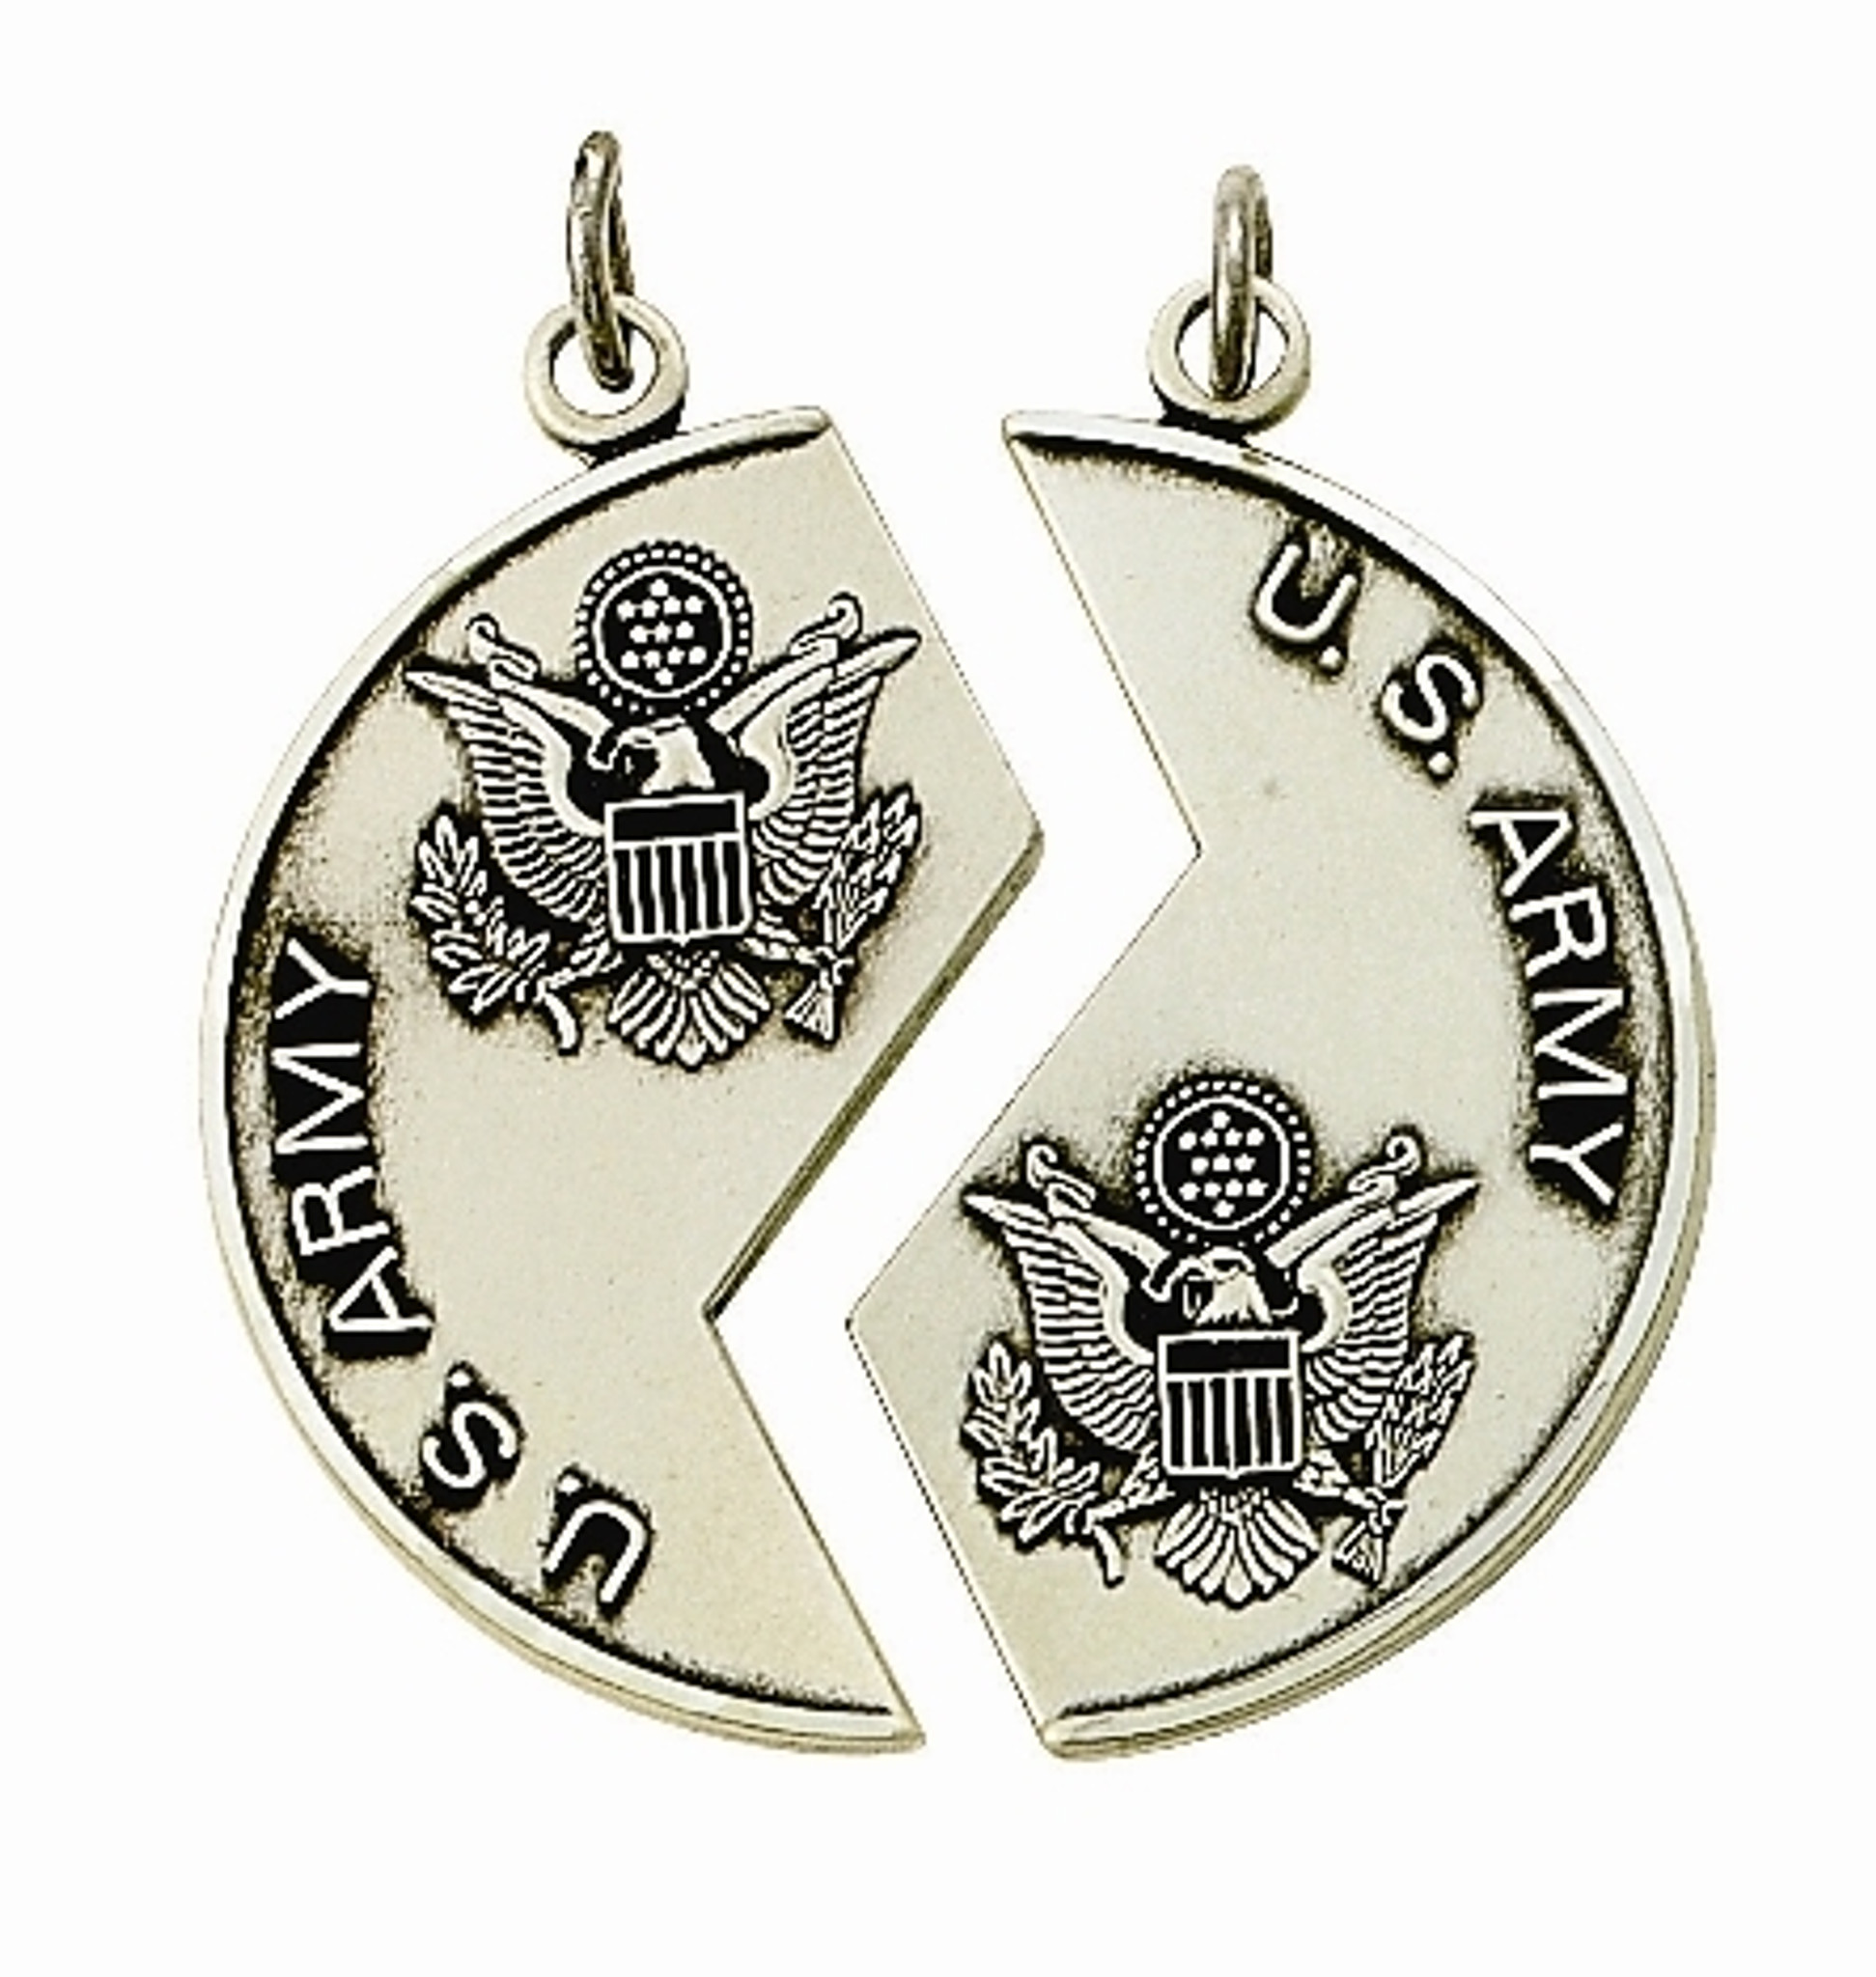 Mizpah Medals